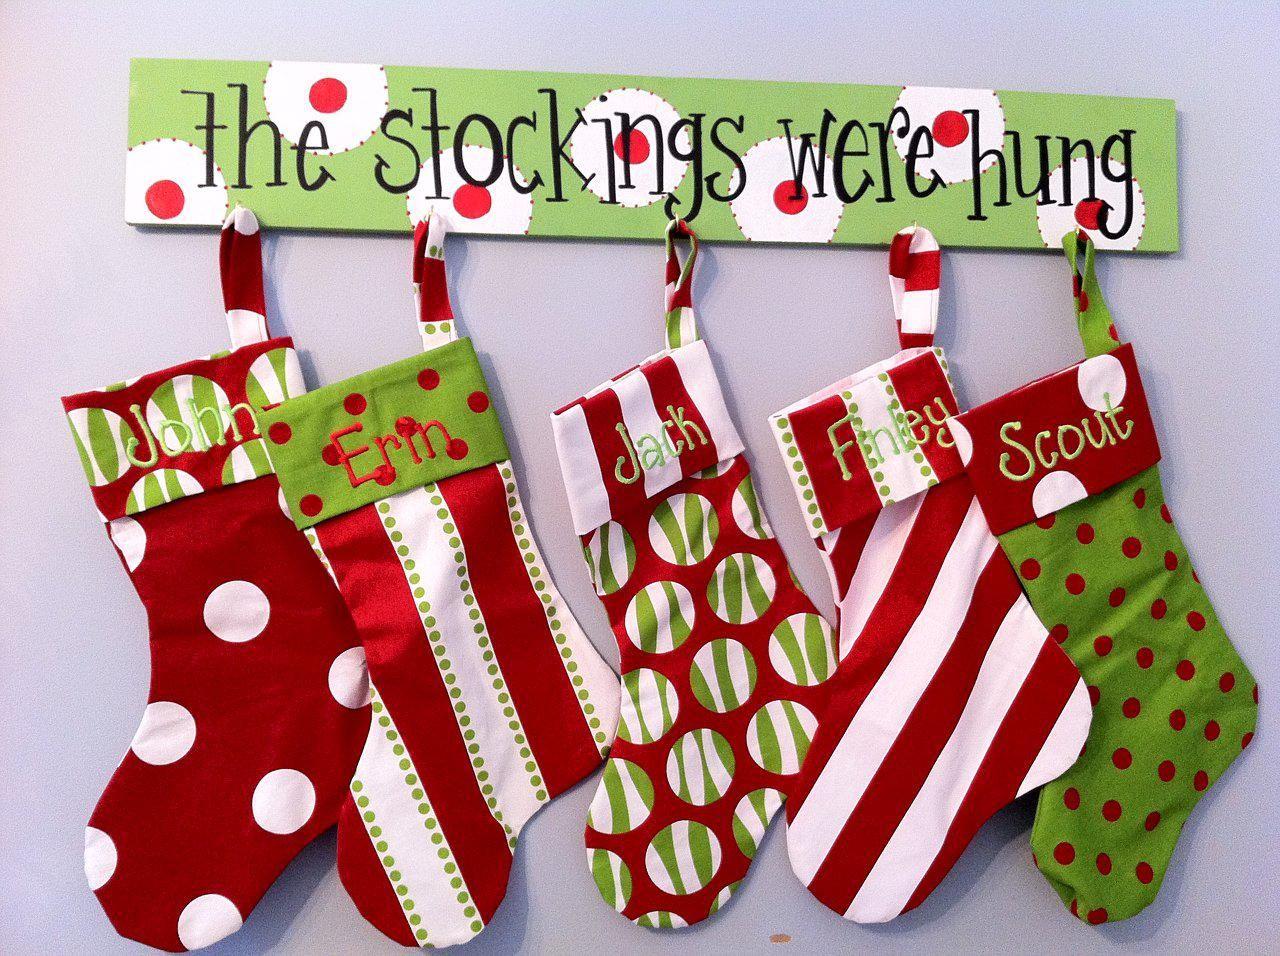 Image detail for stocking holder 6x36 wooden hanger can